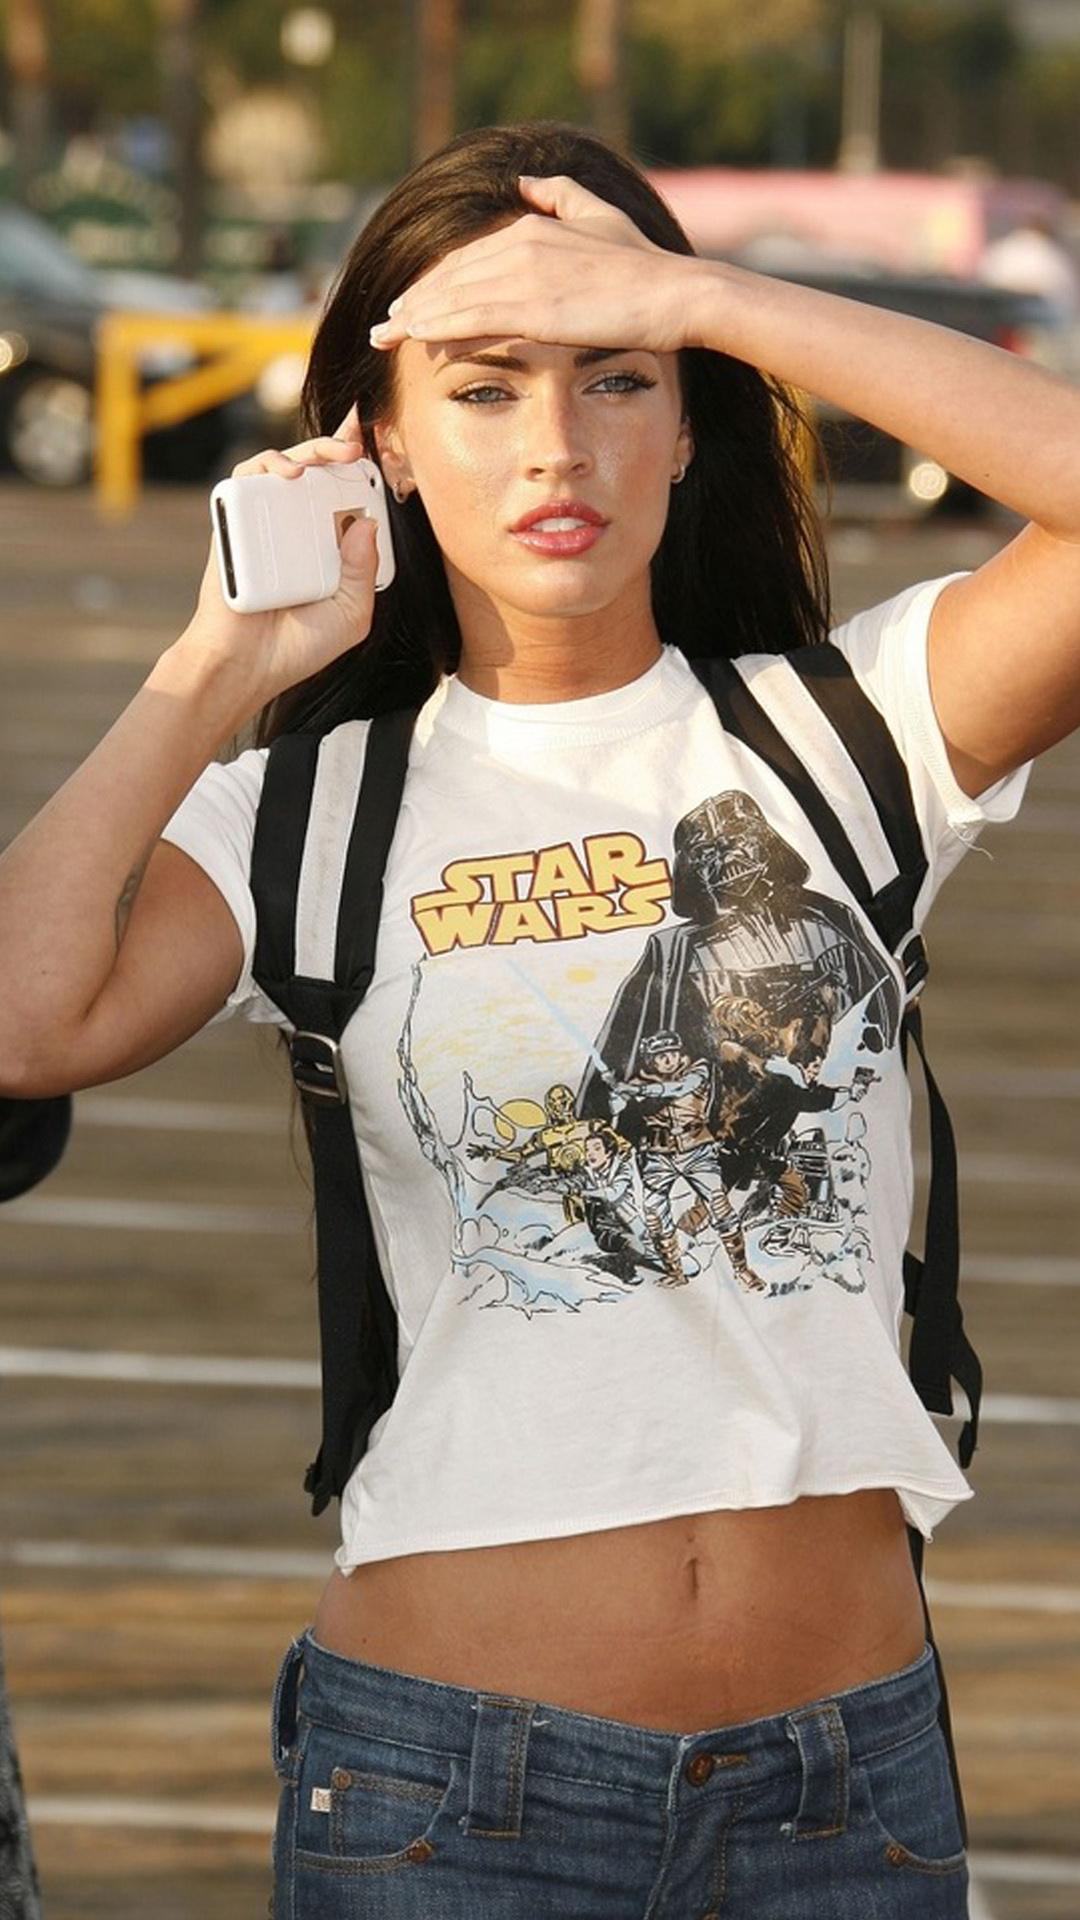 Megan Fox Star Wars t shirt Best htc one wallpapers